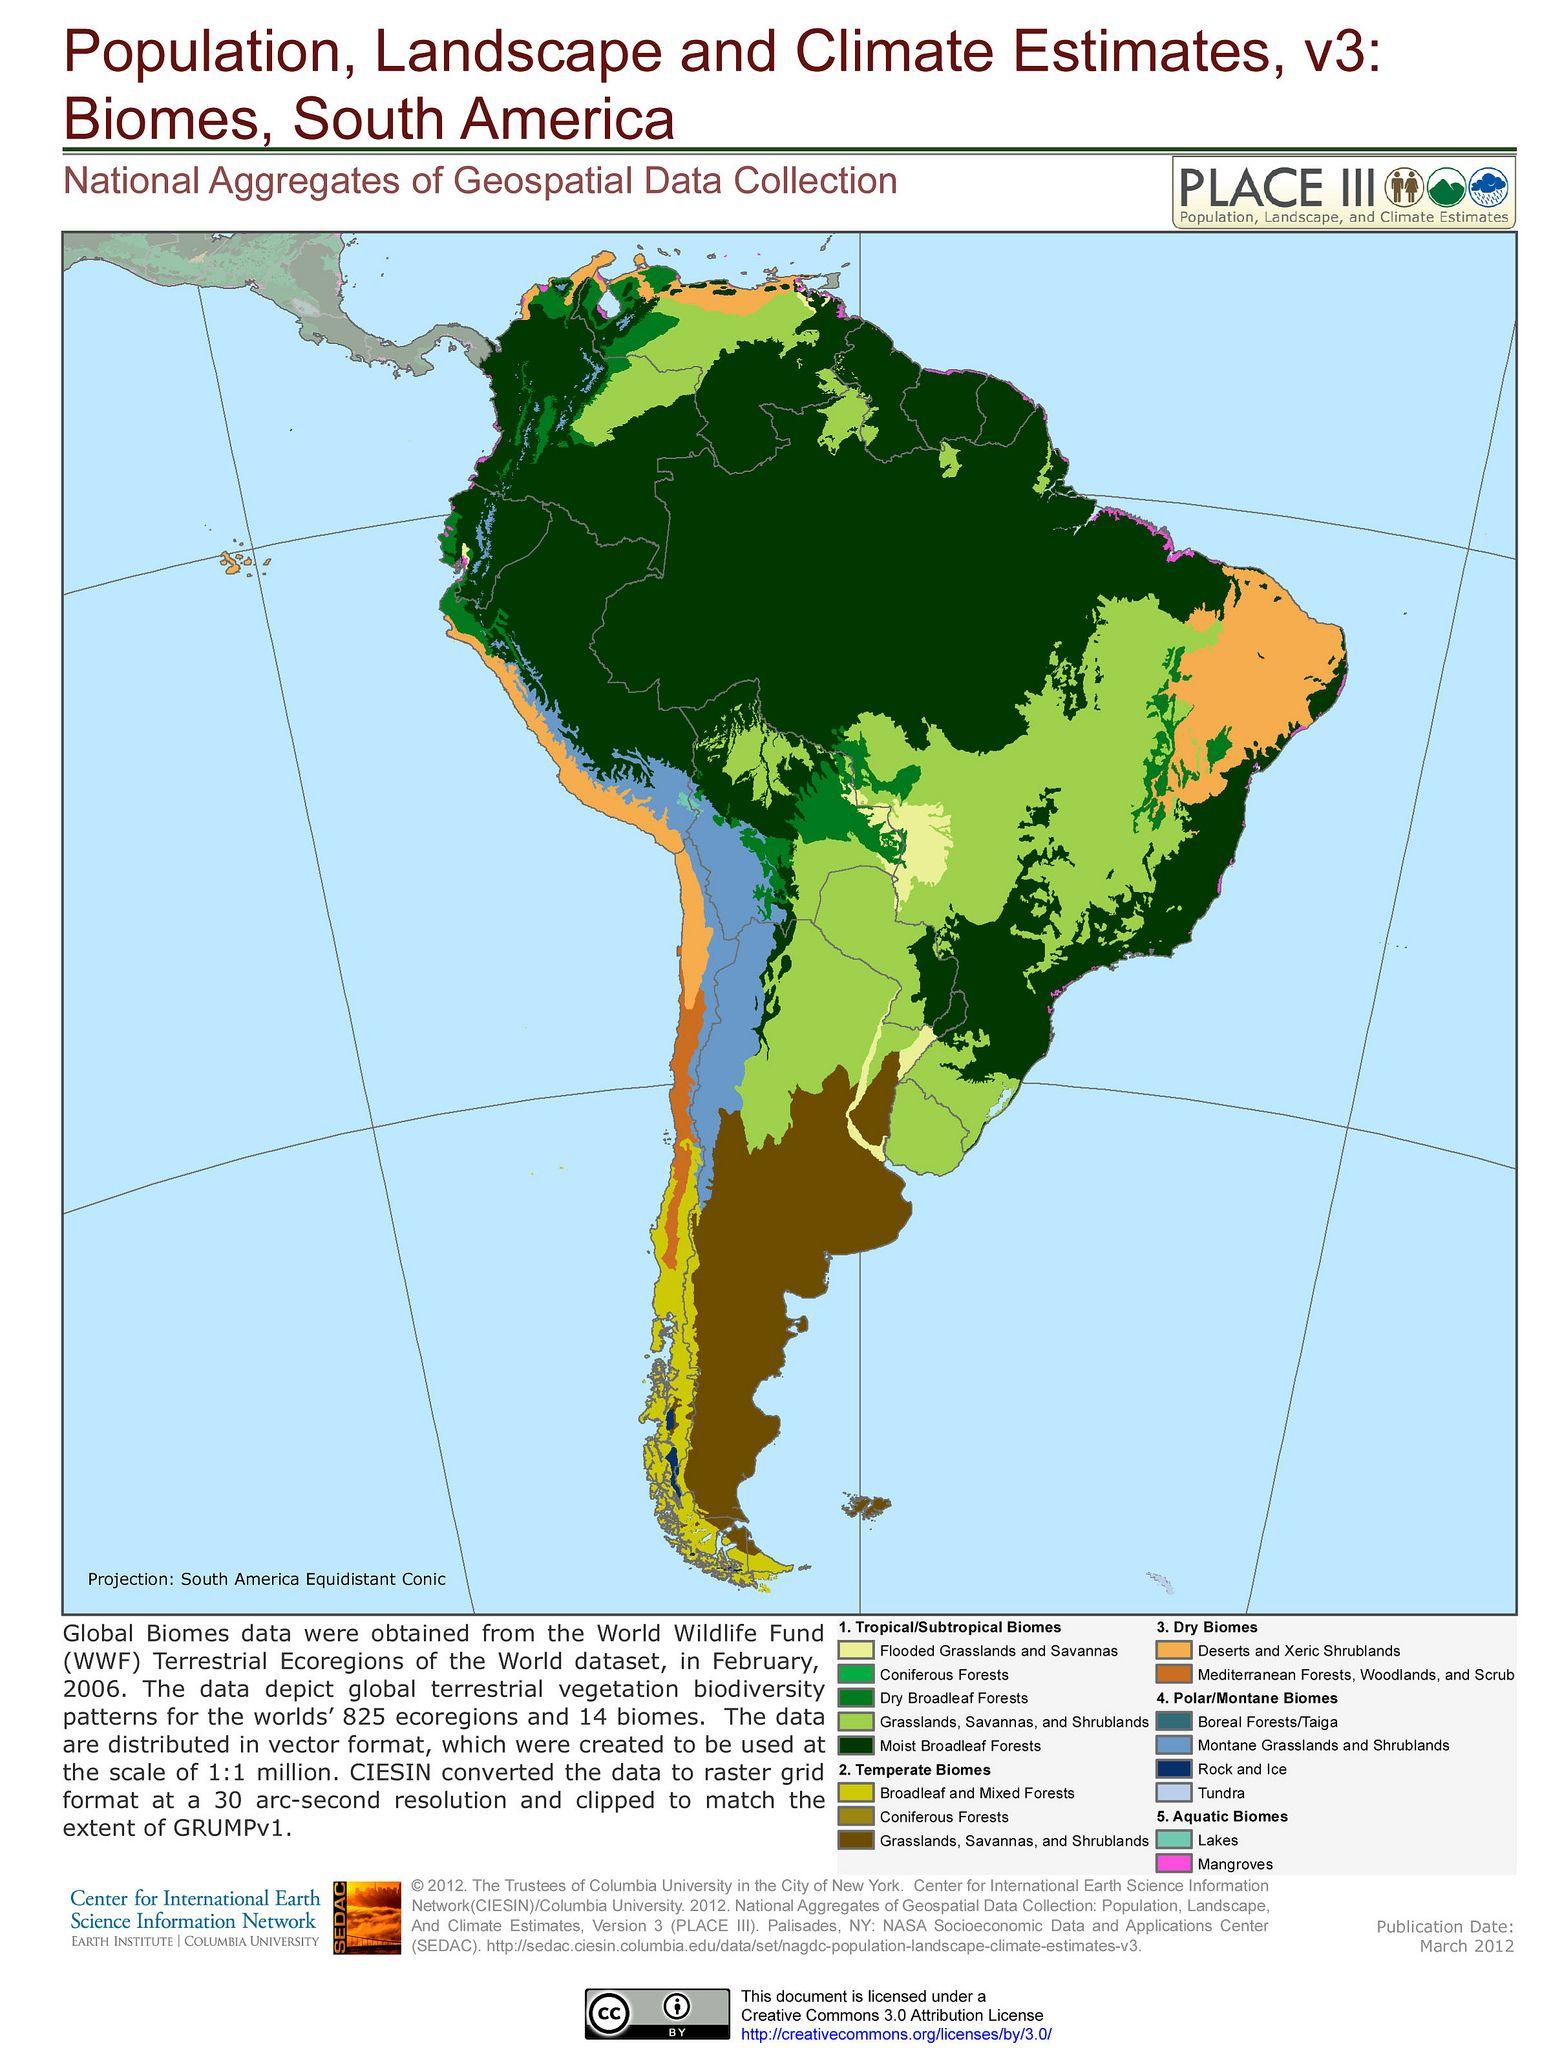 Biomes South America